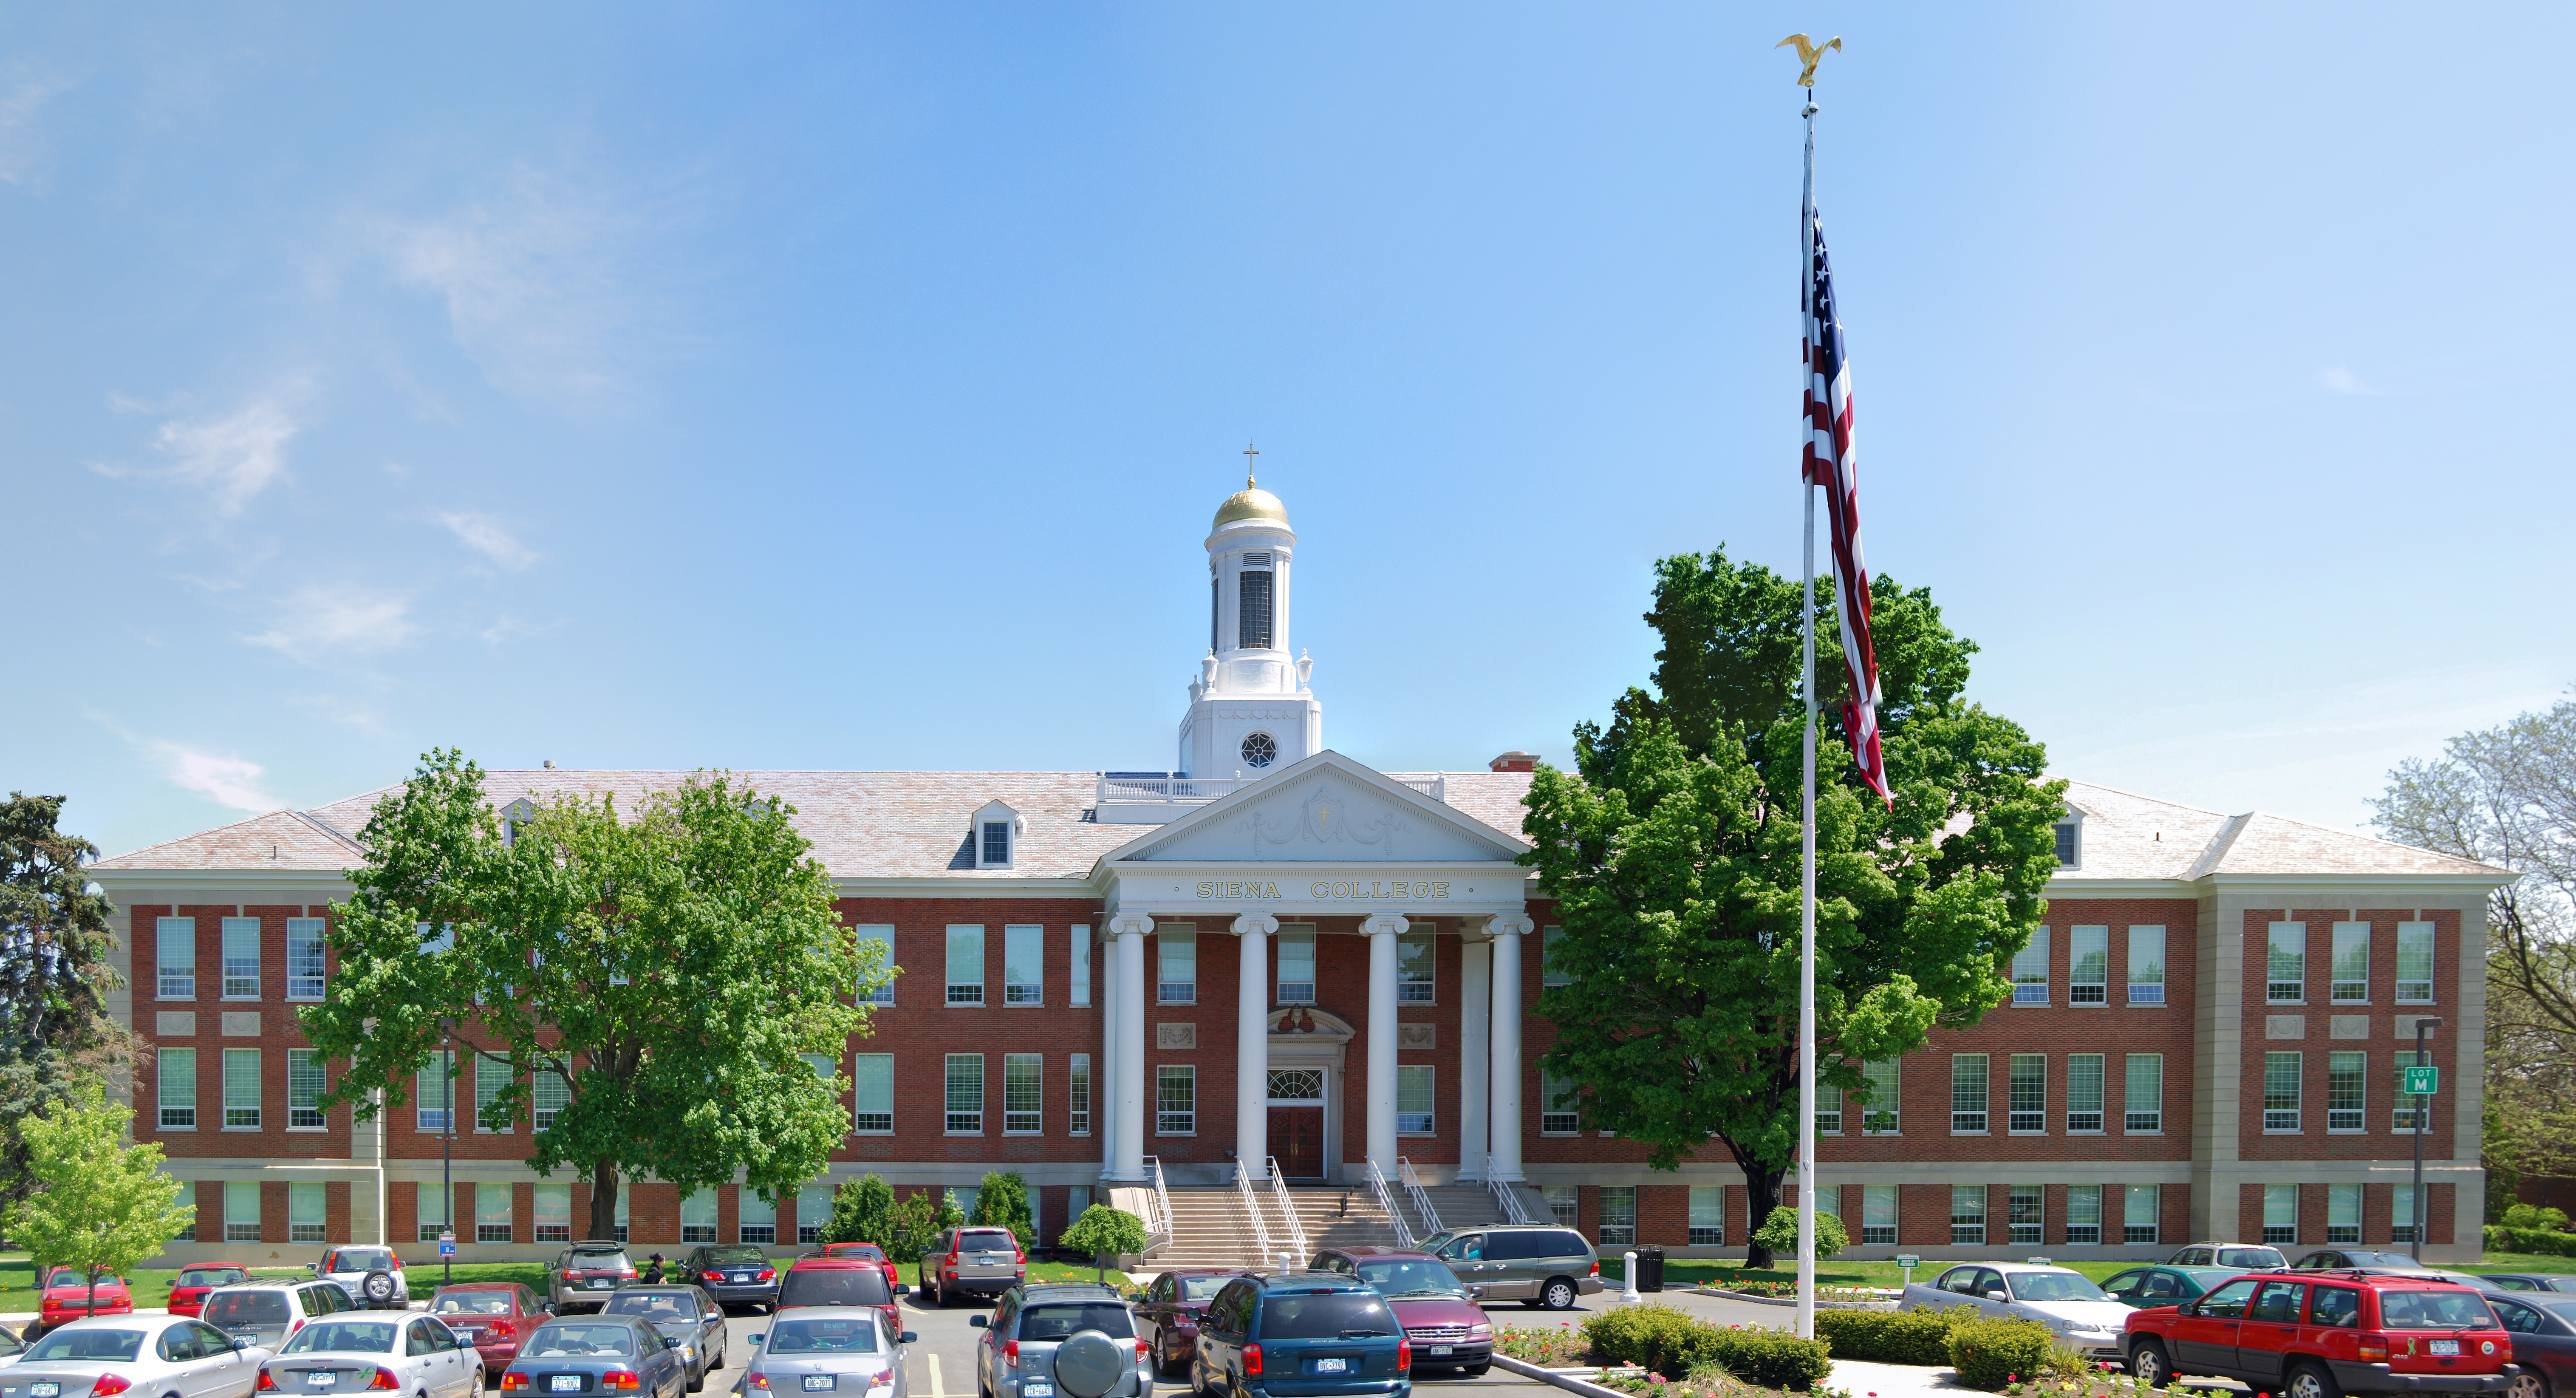 Siena College 61